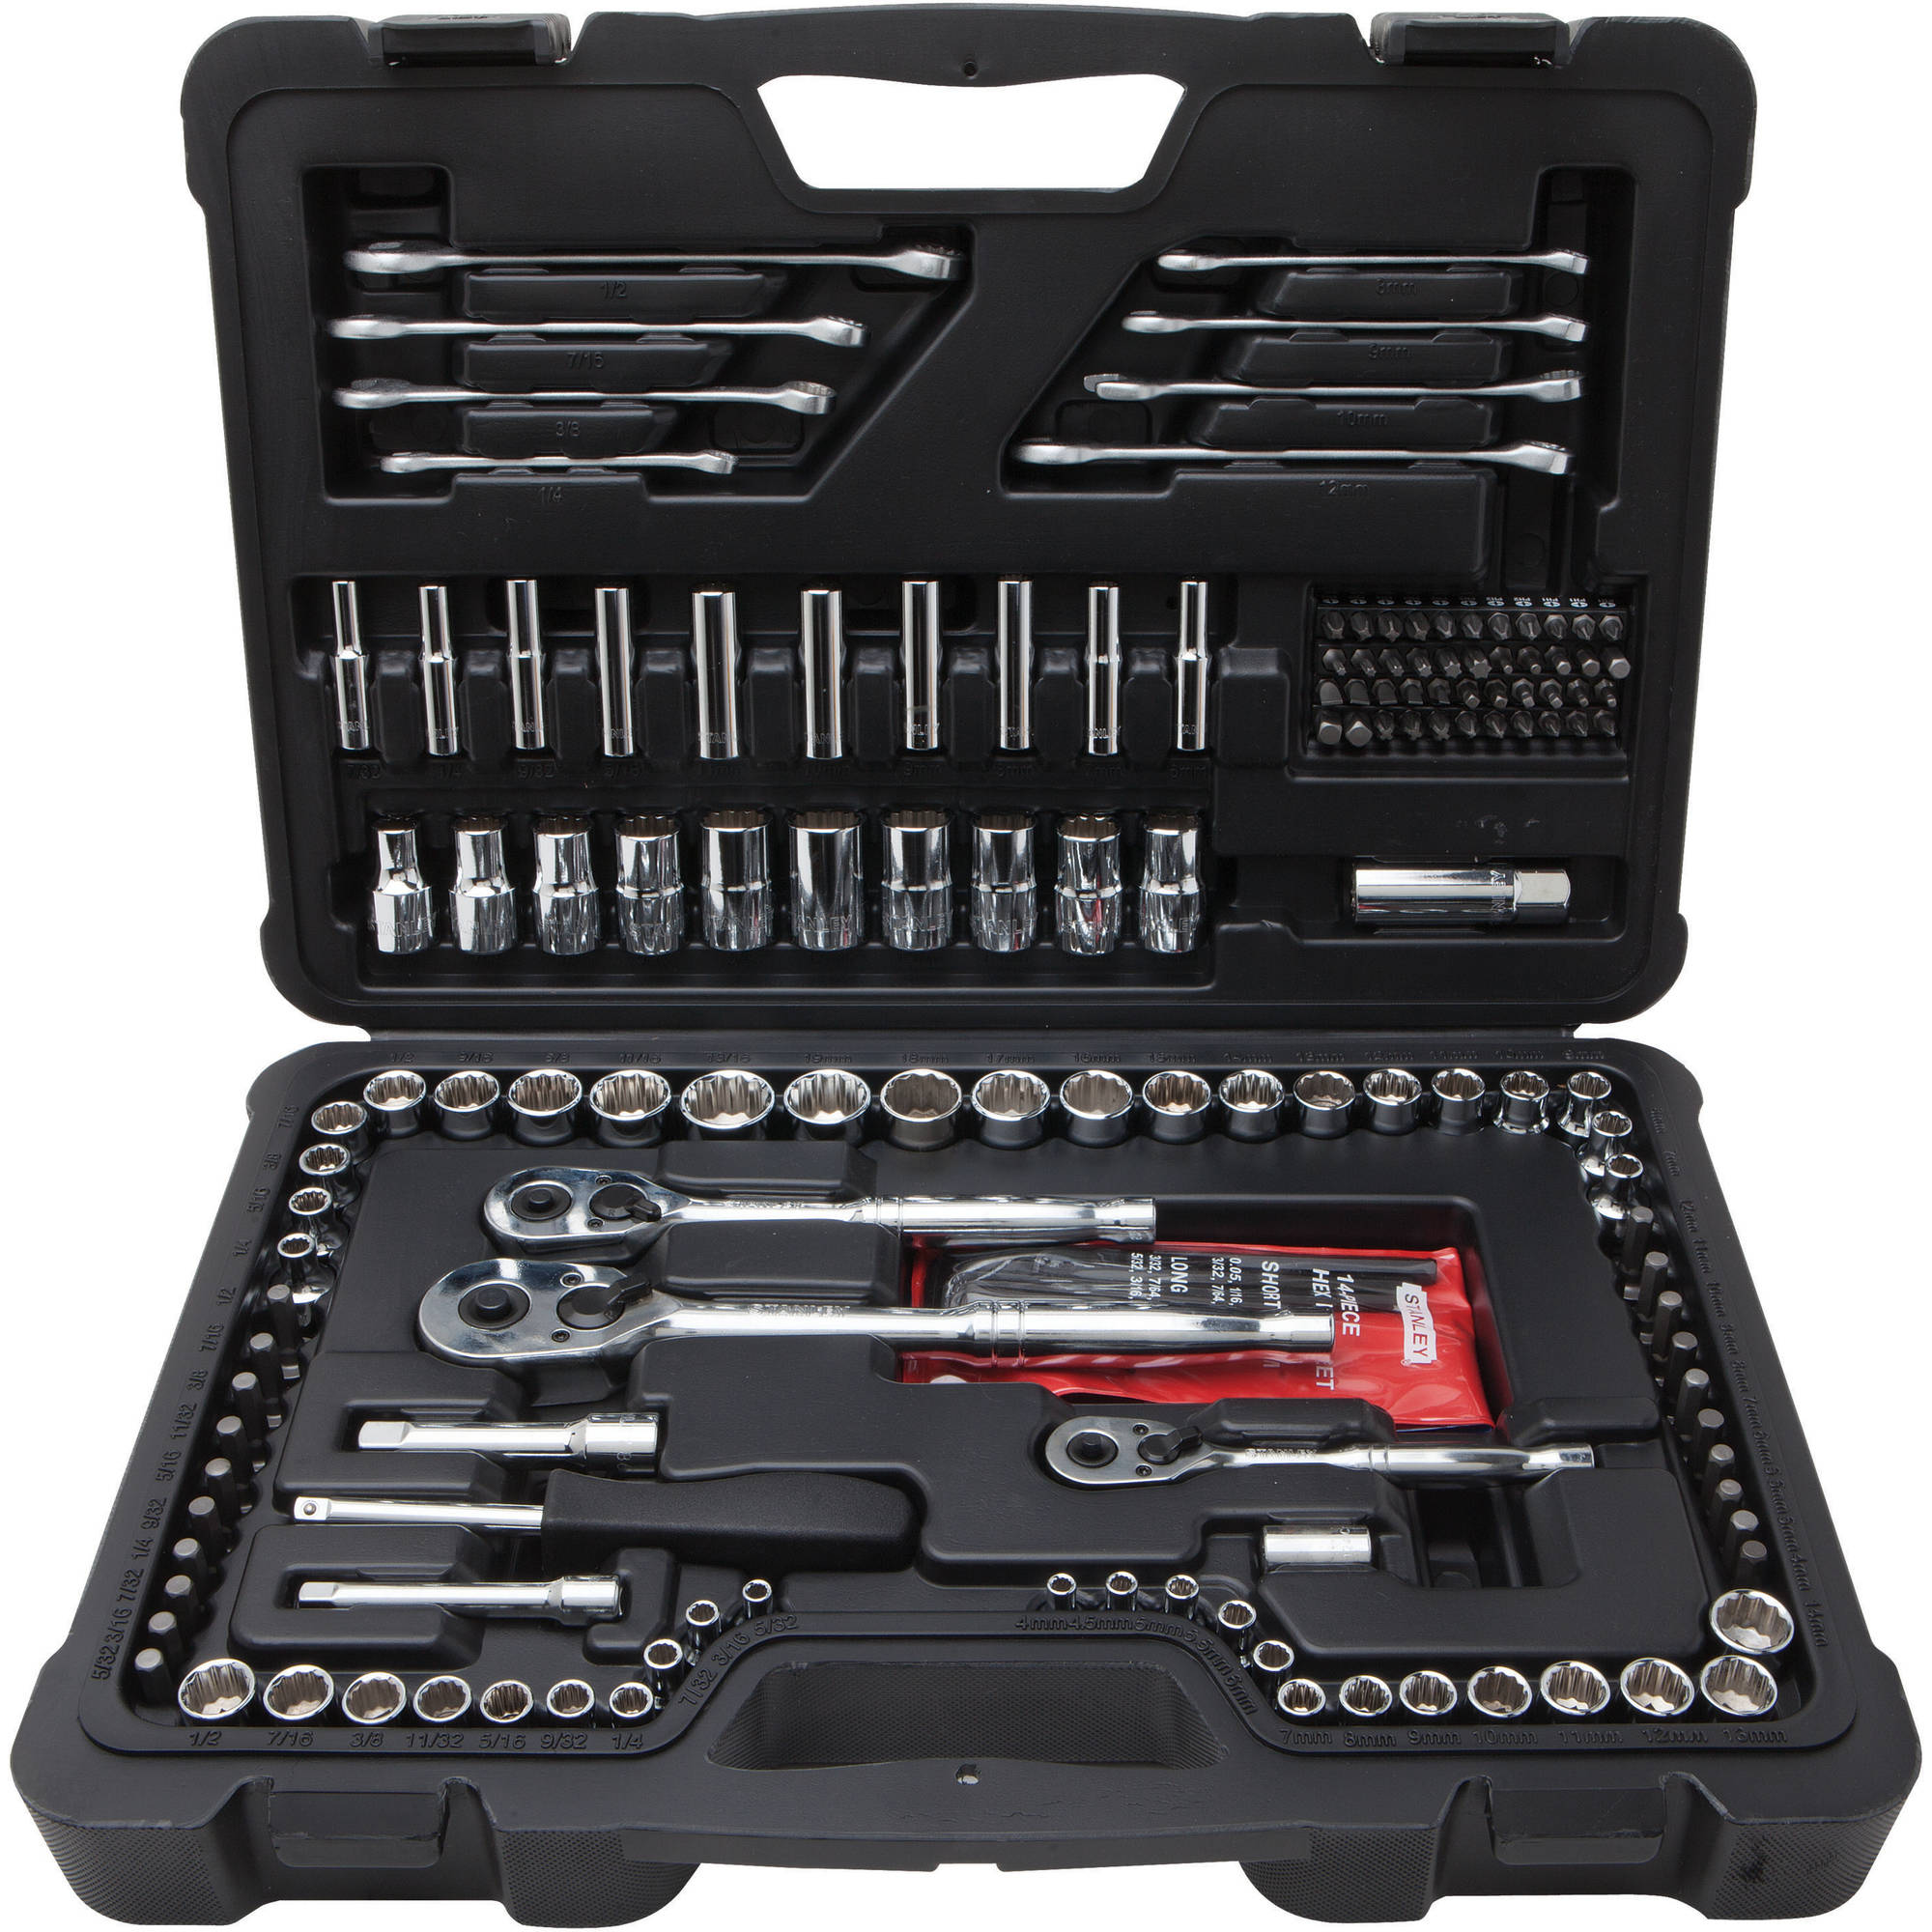 STANLEY 173-Piece Mechanics Tool Set | STMT74857